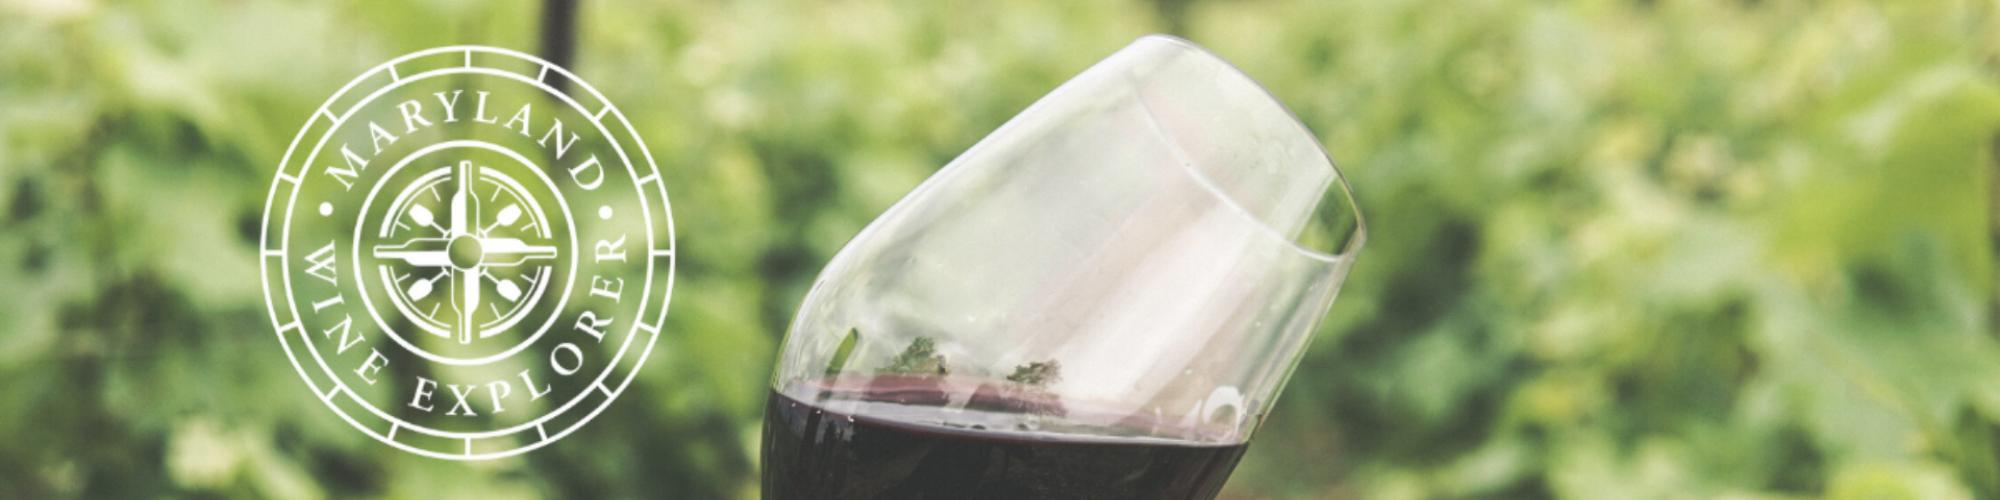 Maryland Wine Explorer banner, red wine glass tilted over vineyard in background